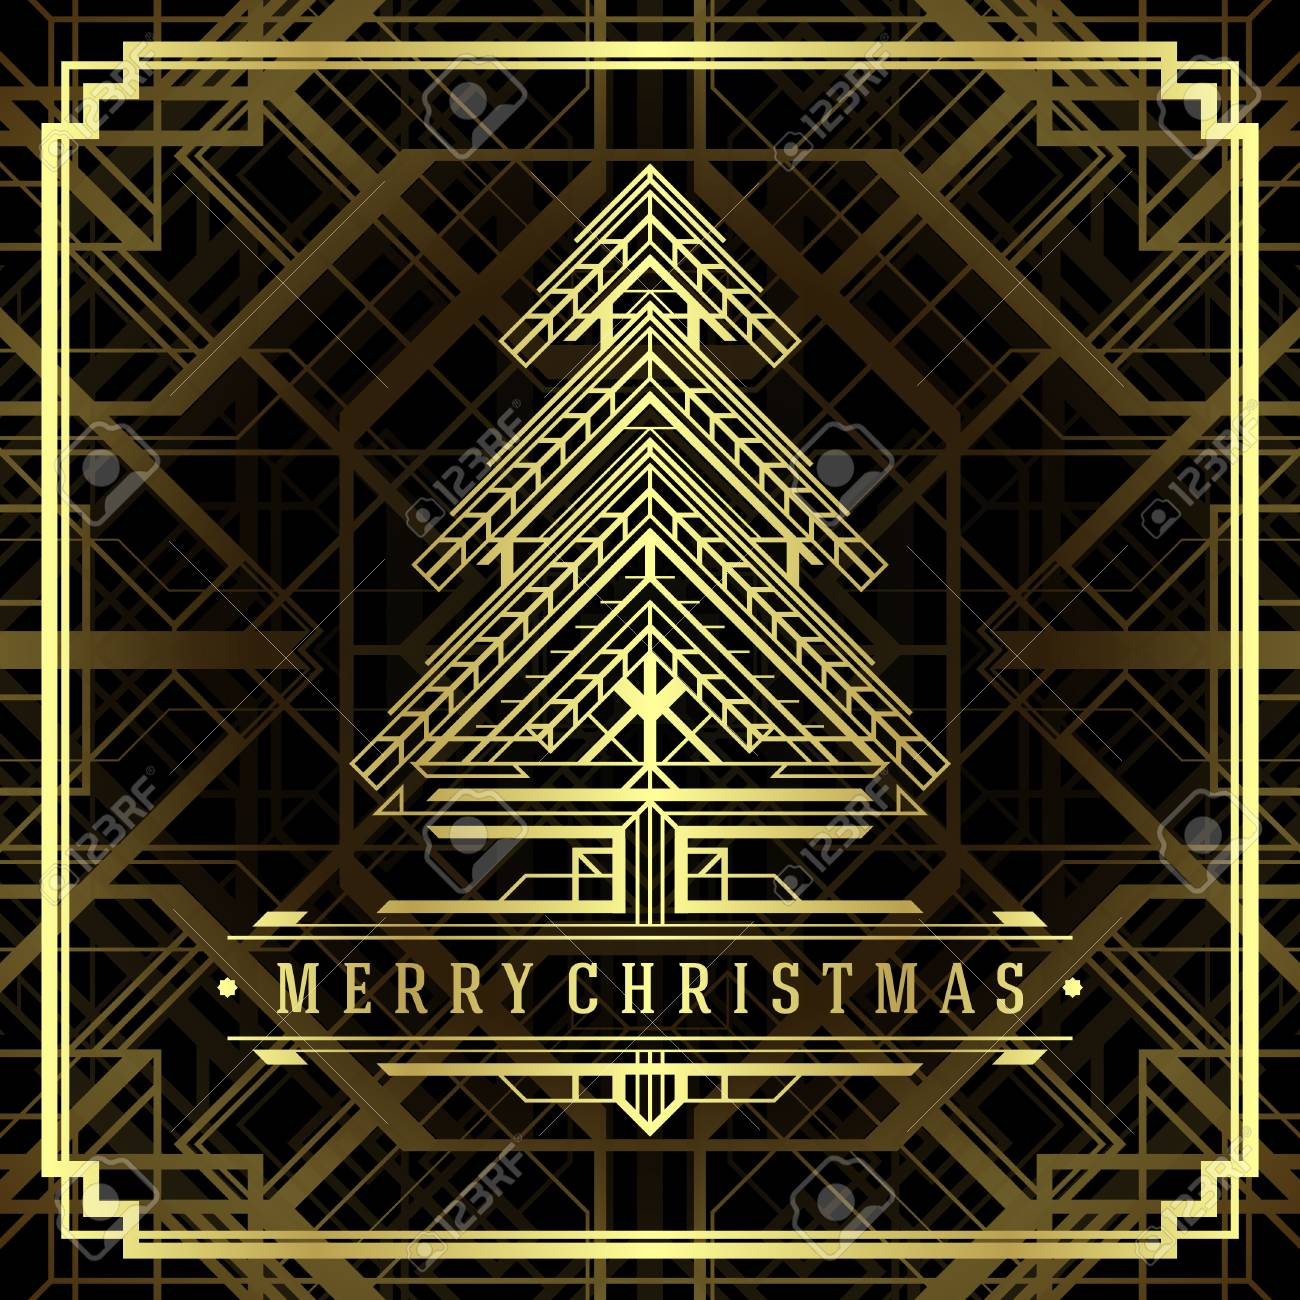 Christmas Tree Art Deco Style Merry Christmas Holidays Wish